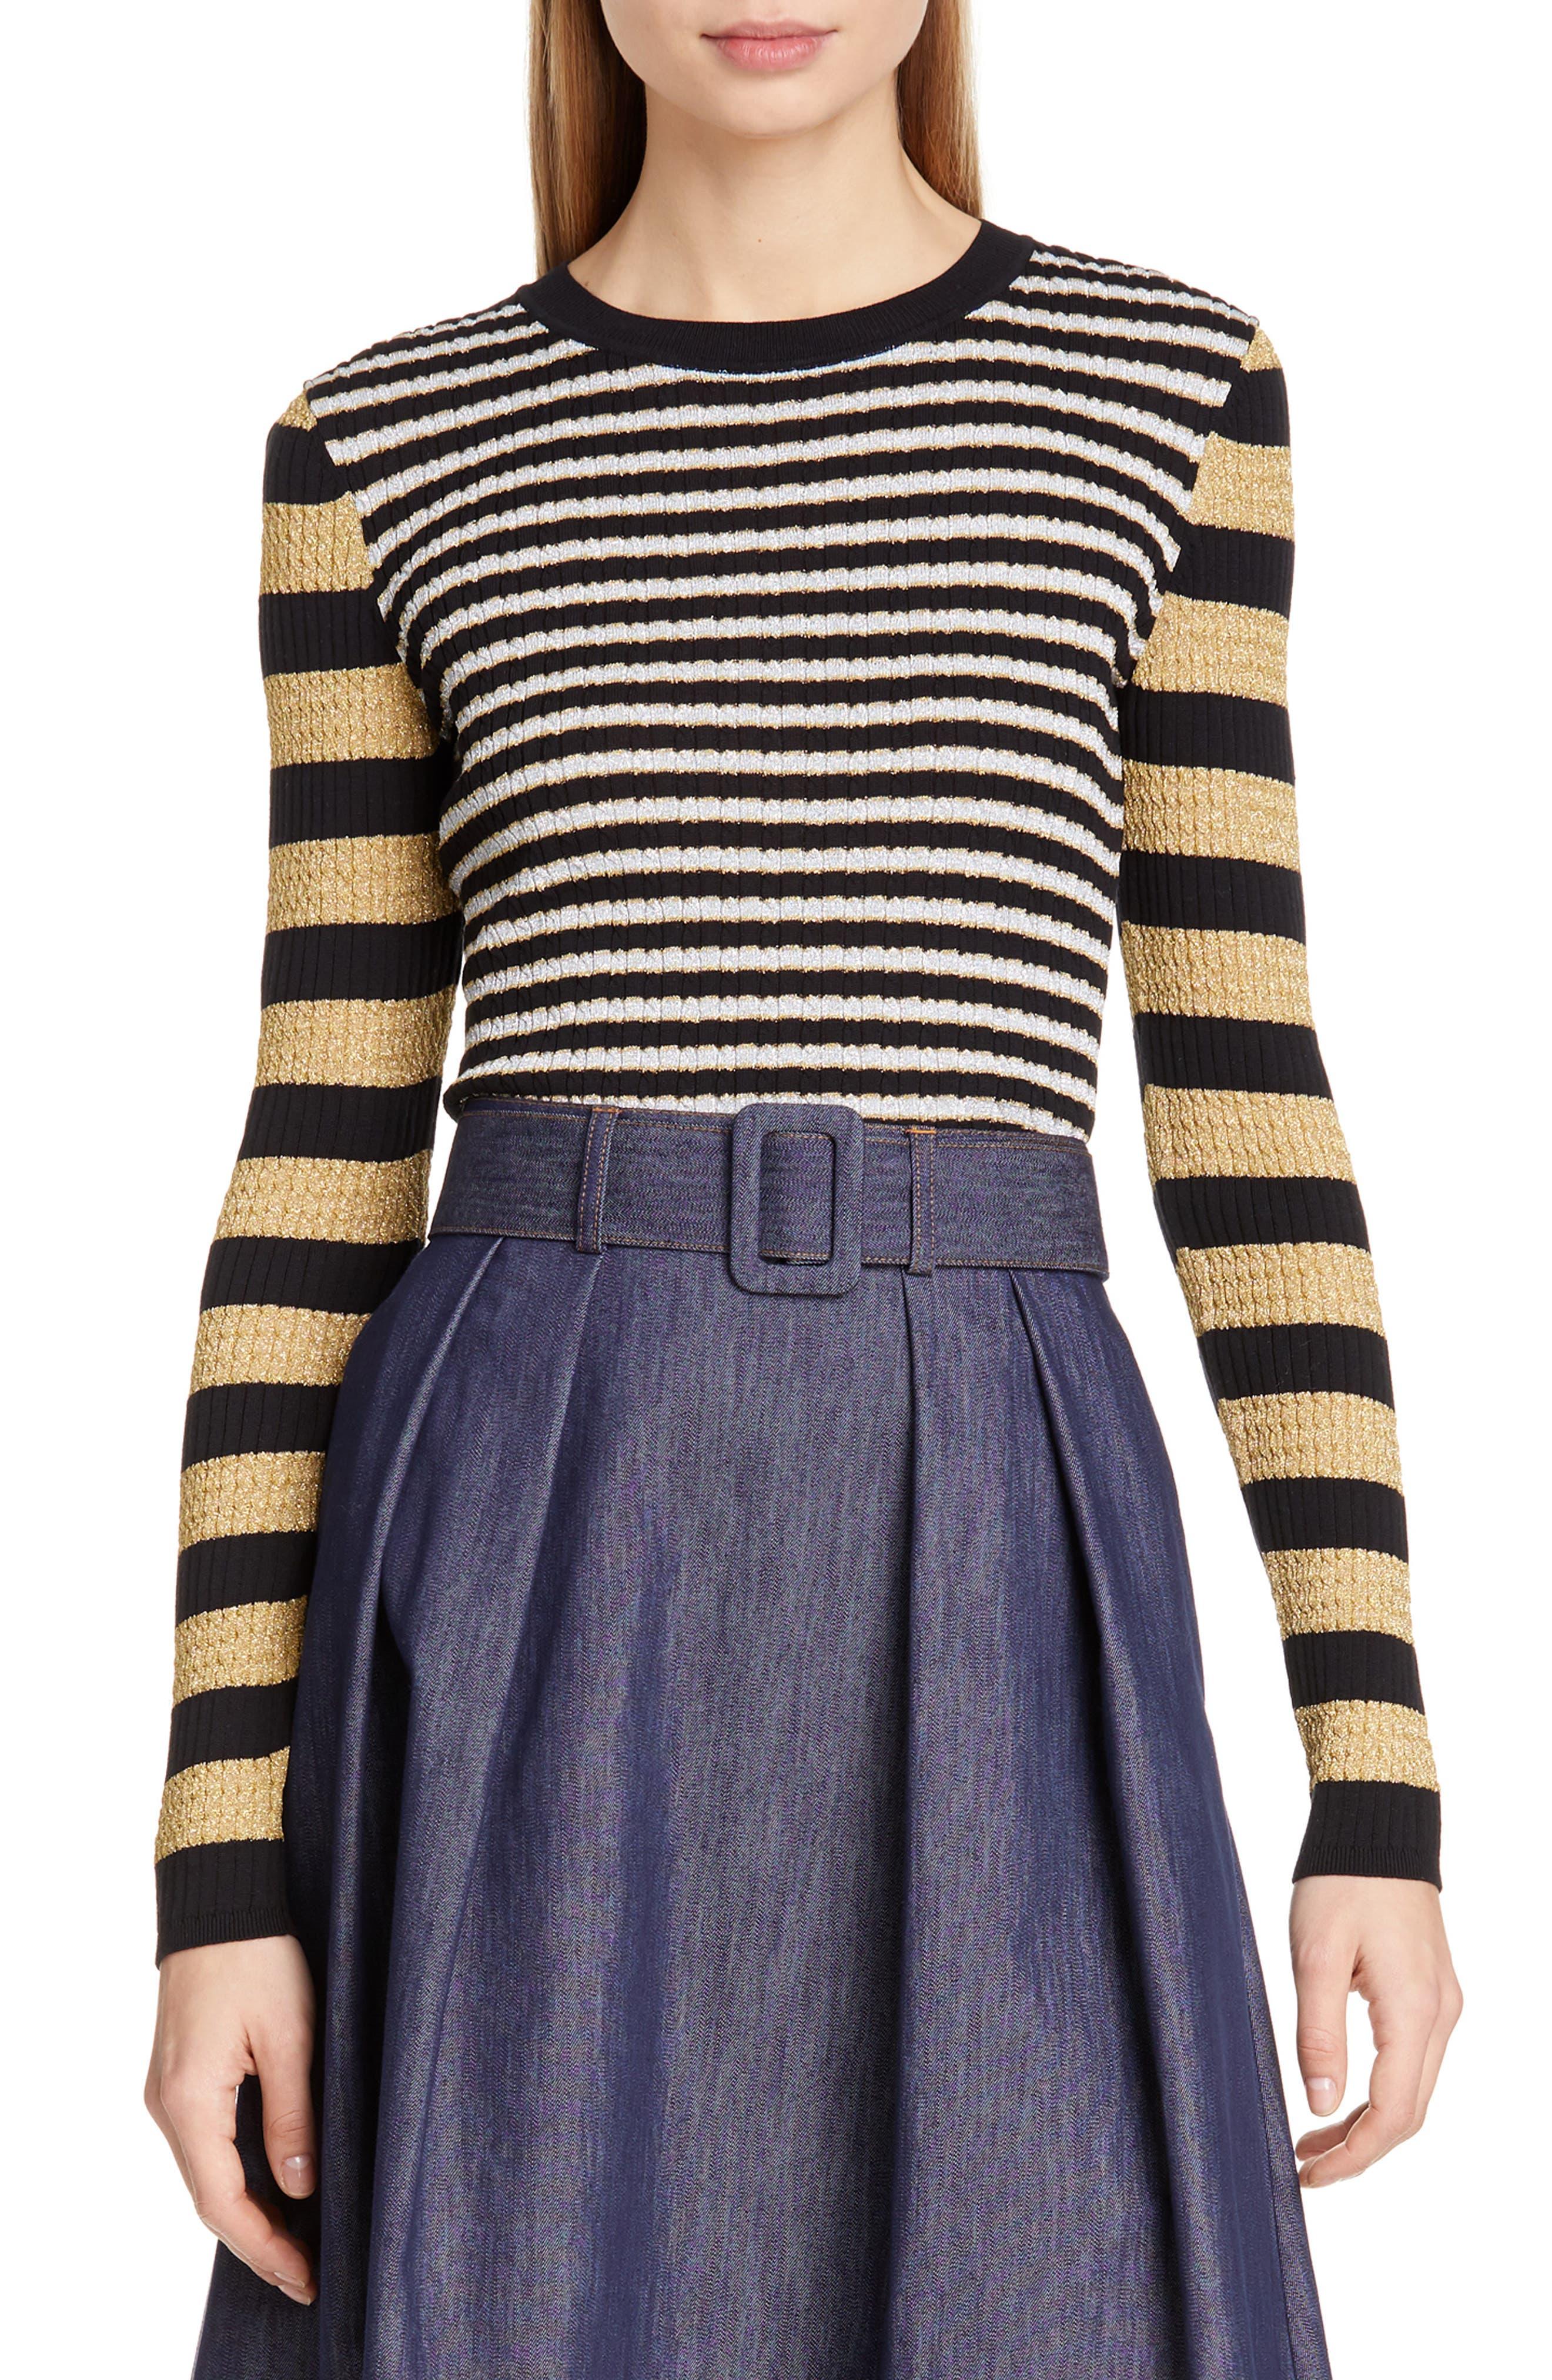 TOMMY X ZENDAYA Metallic Stripe Knit Top, Main, color, BLACK BEAUTY MULTI